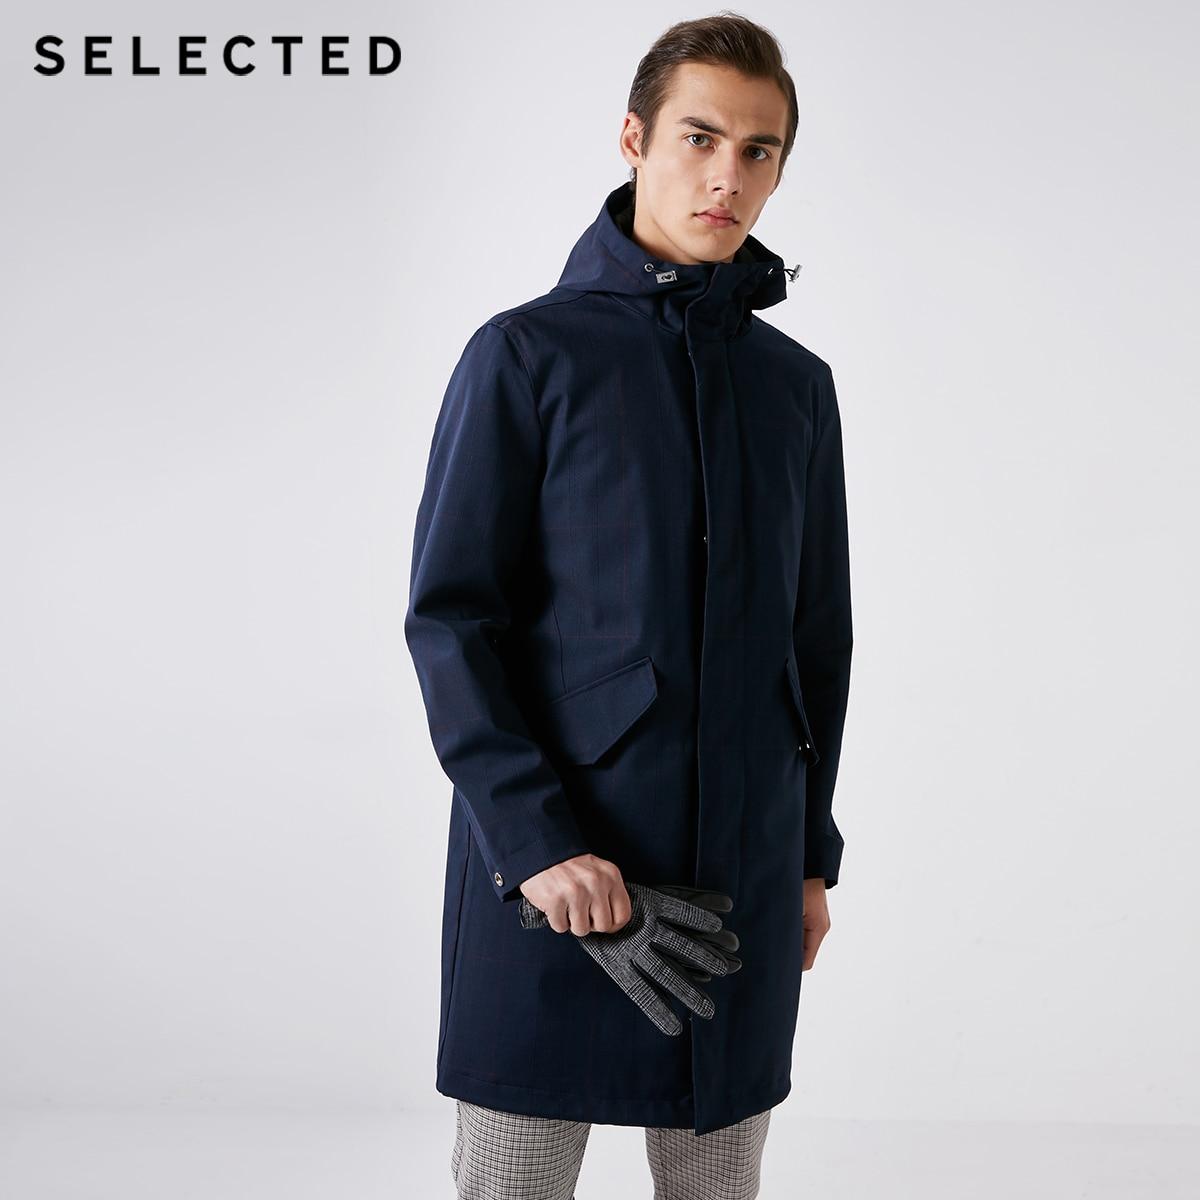 SELECTED Men's Spring Dark Plaid Mid-length Hooded Trench Coat S|4191OM511